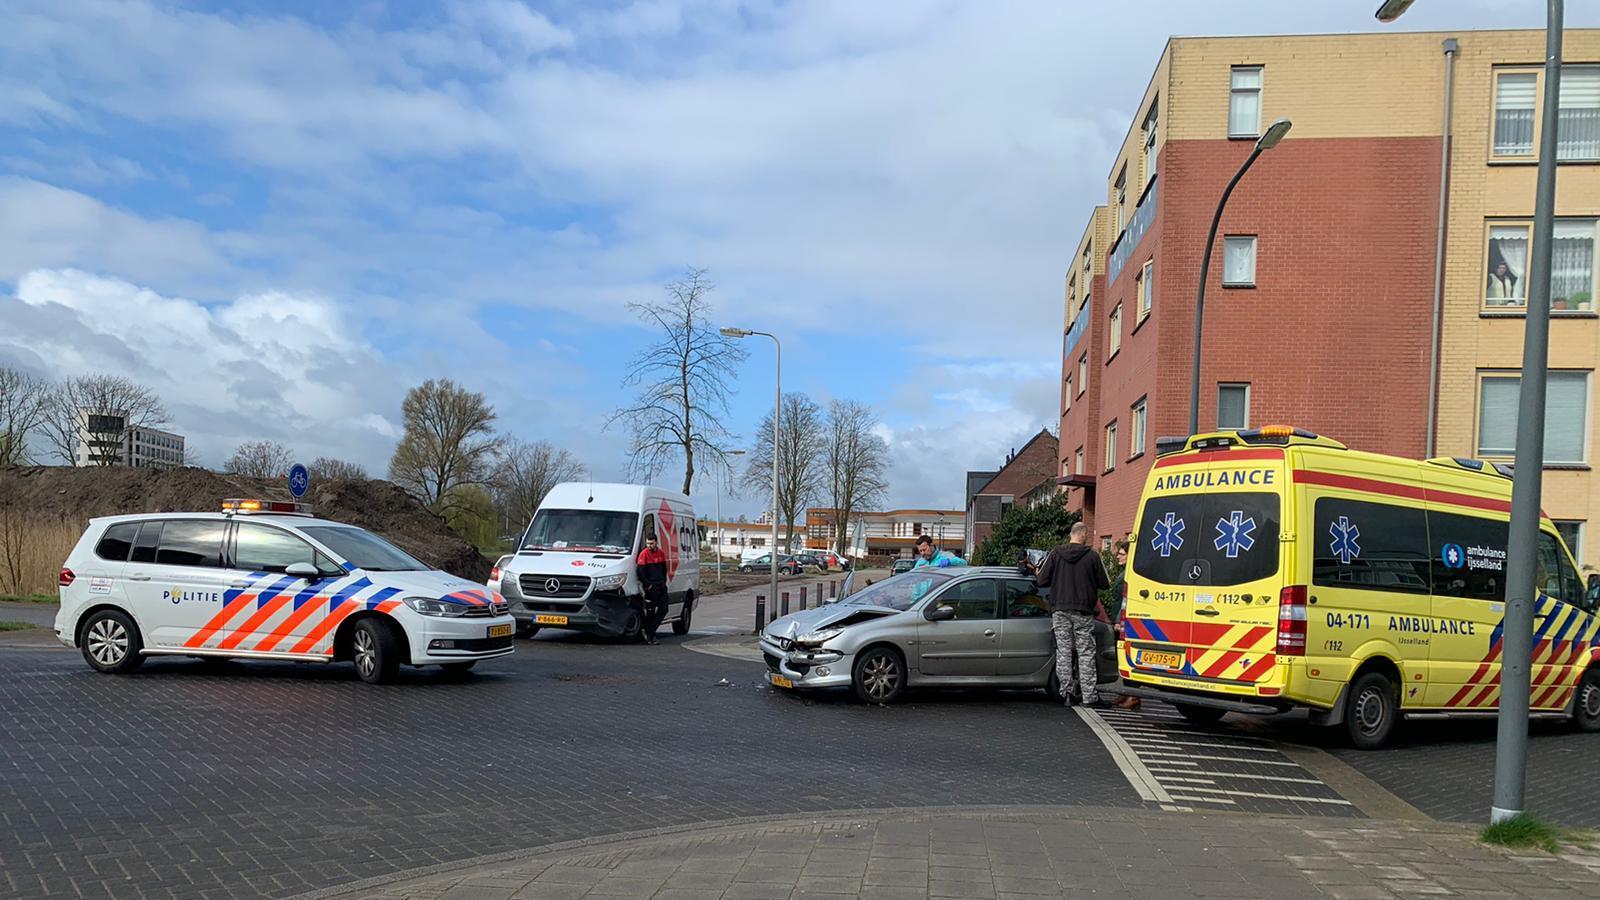 Botsing tussen personenauto en bestelbus in Deventer, één persoon gewond.